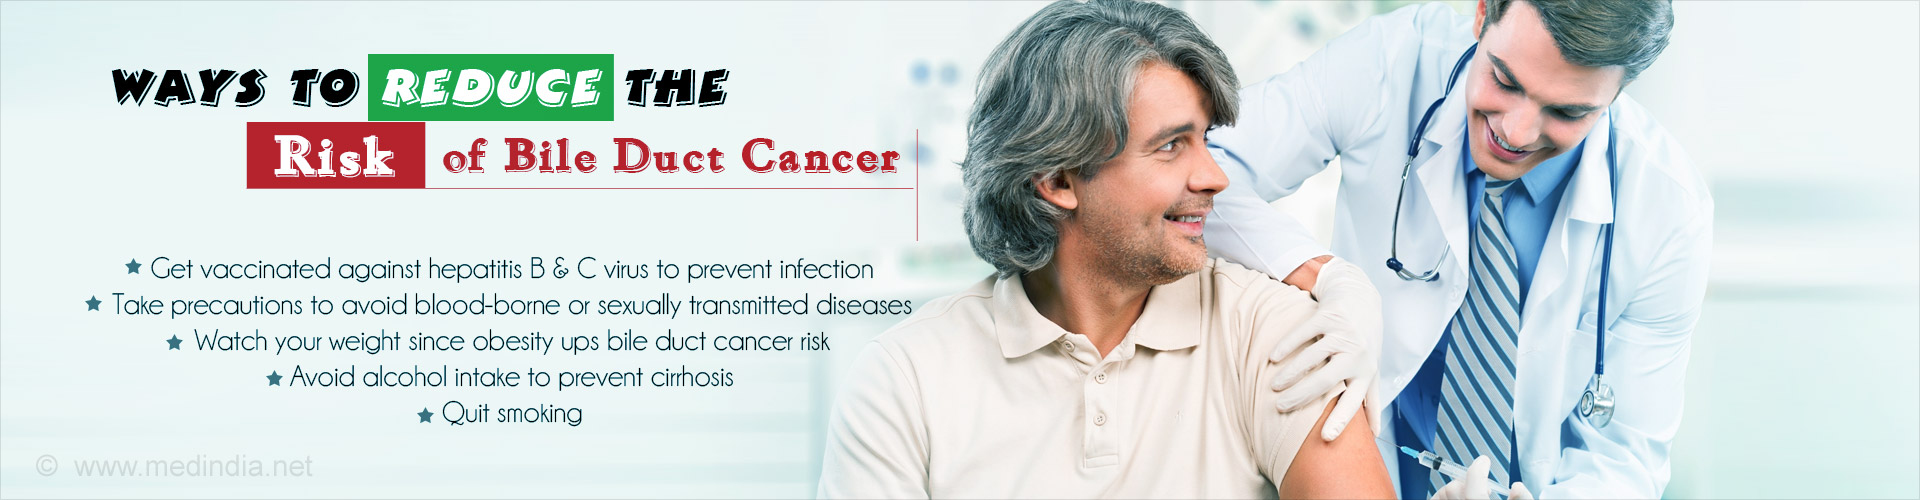 bileduct cancer